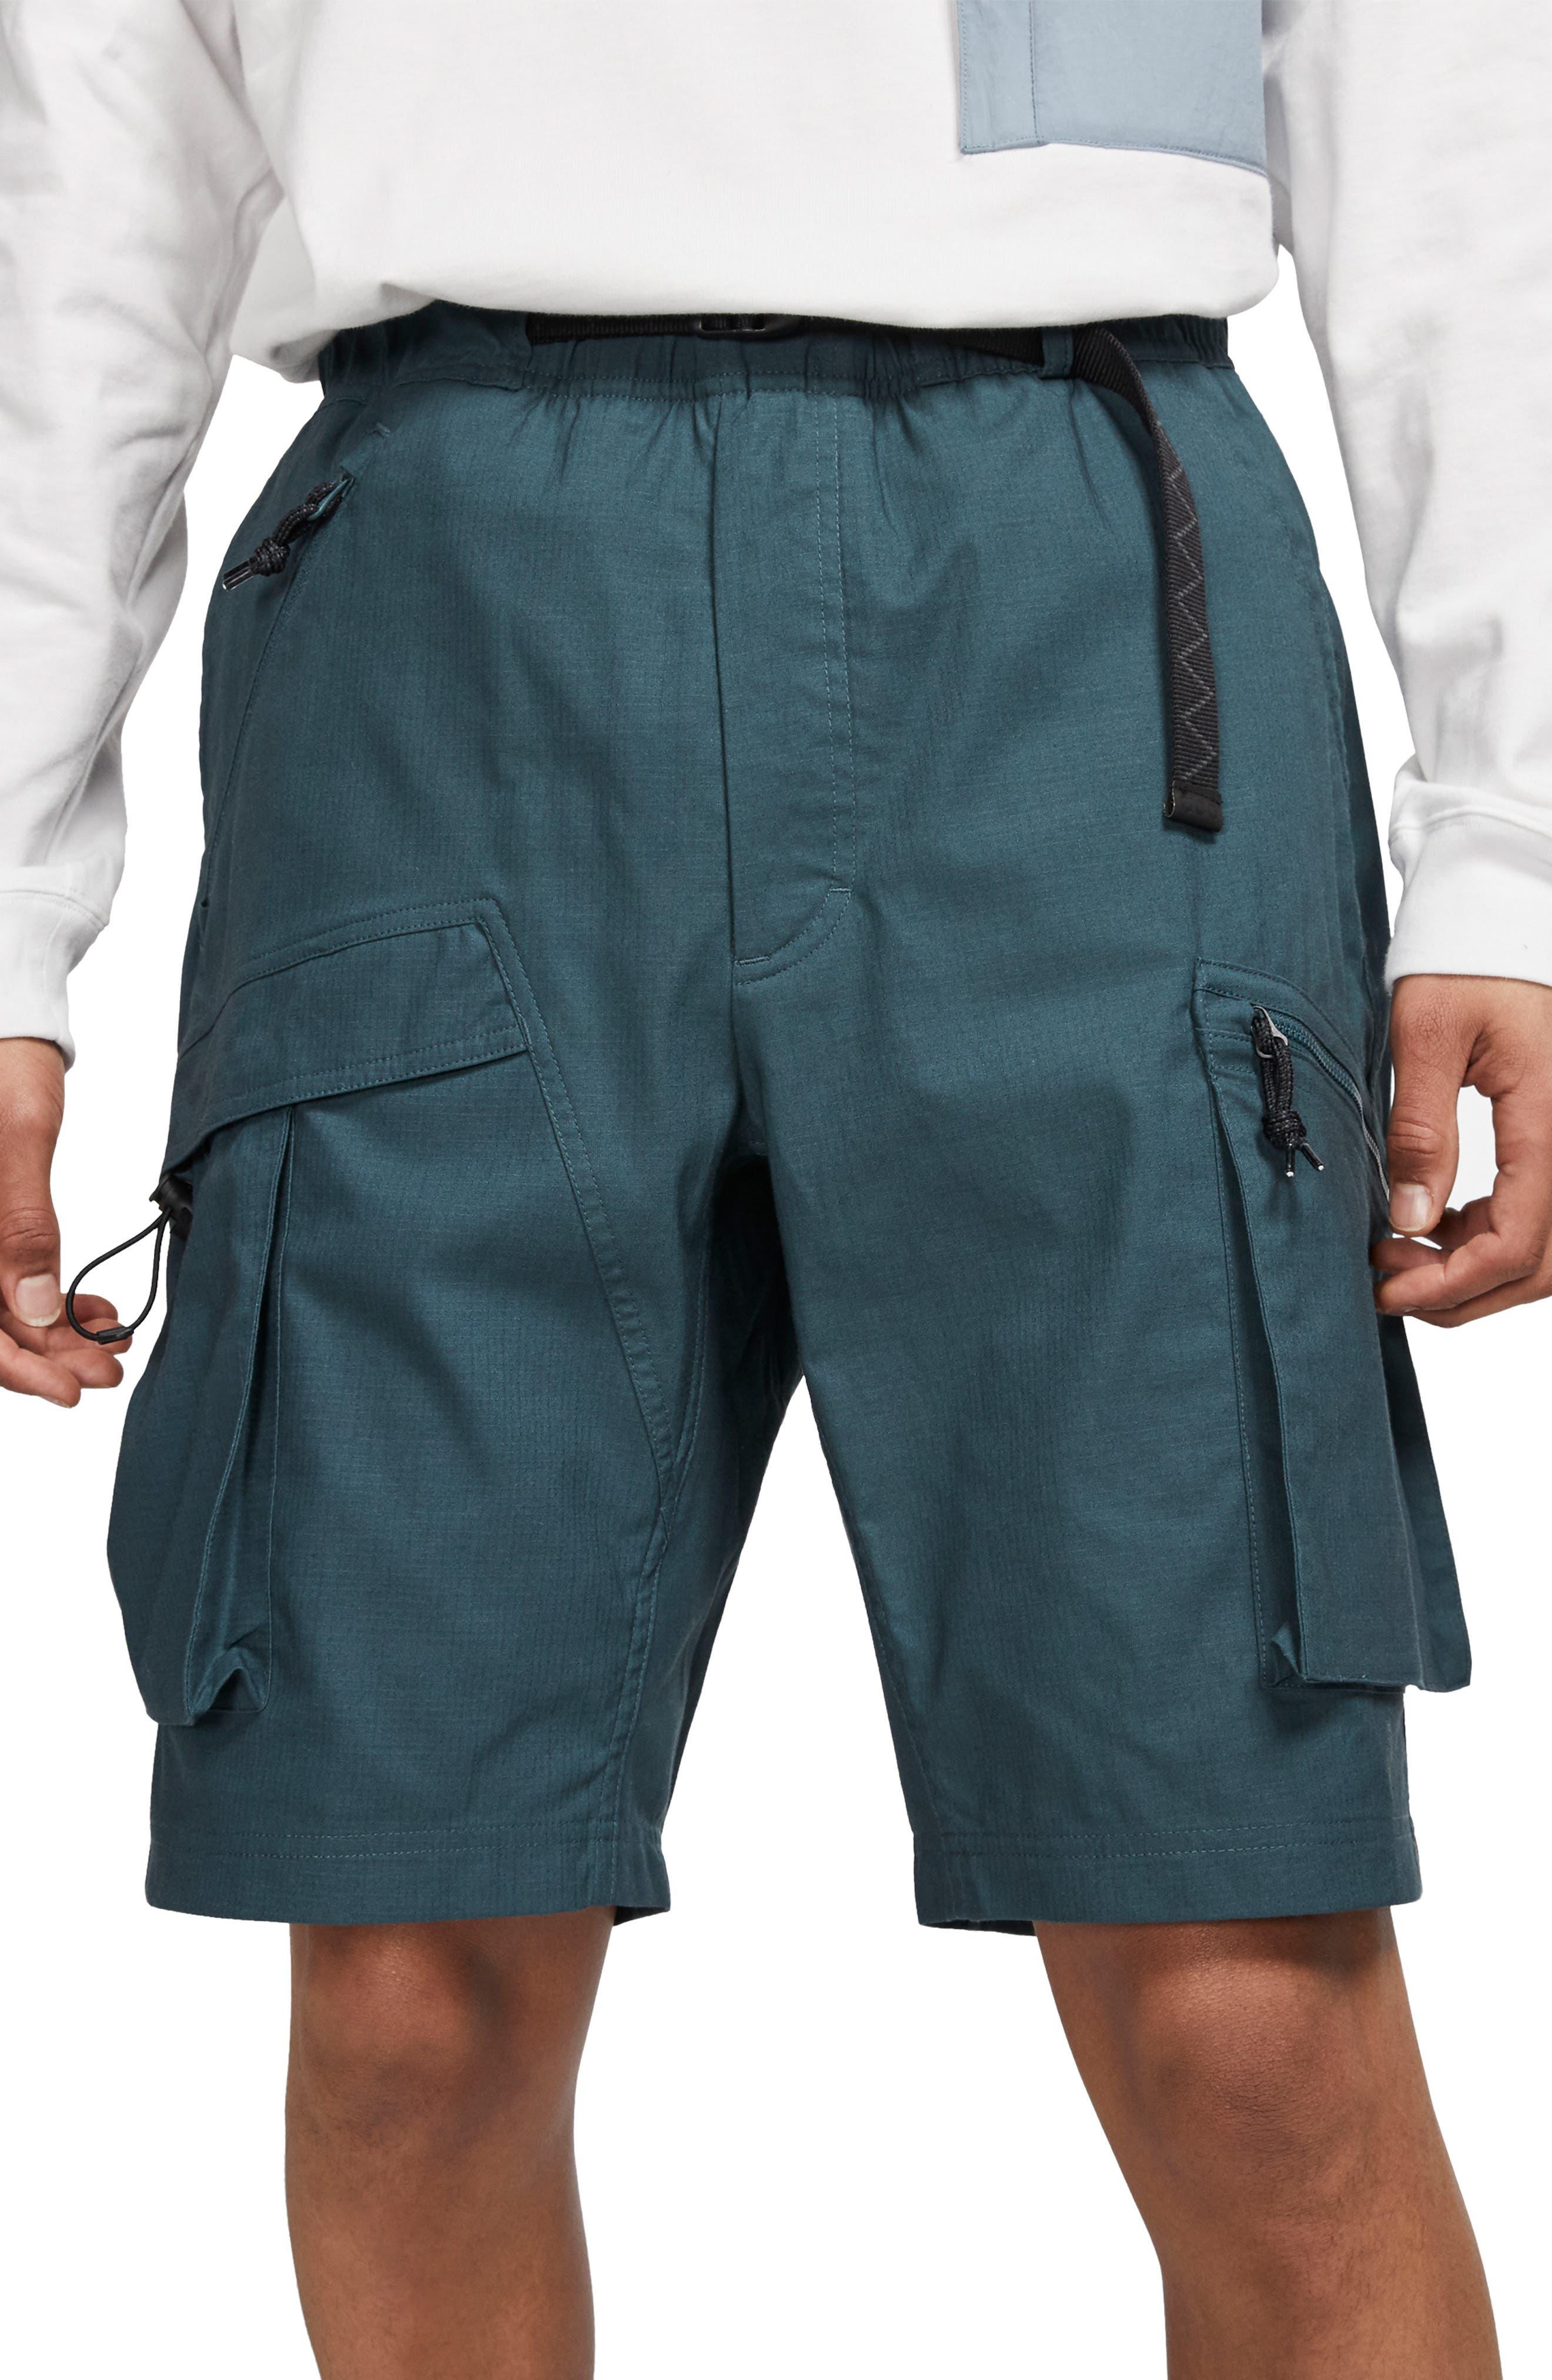 Nike Acg Cargo Shorts, Green